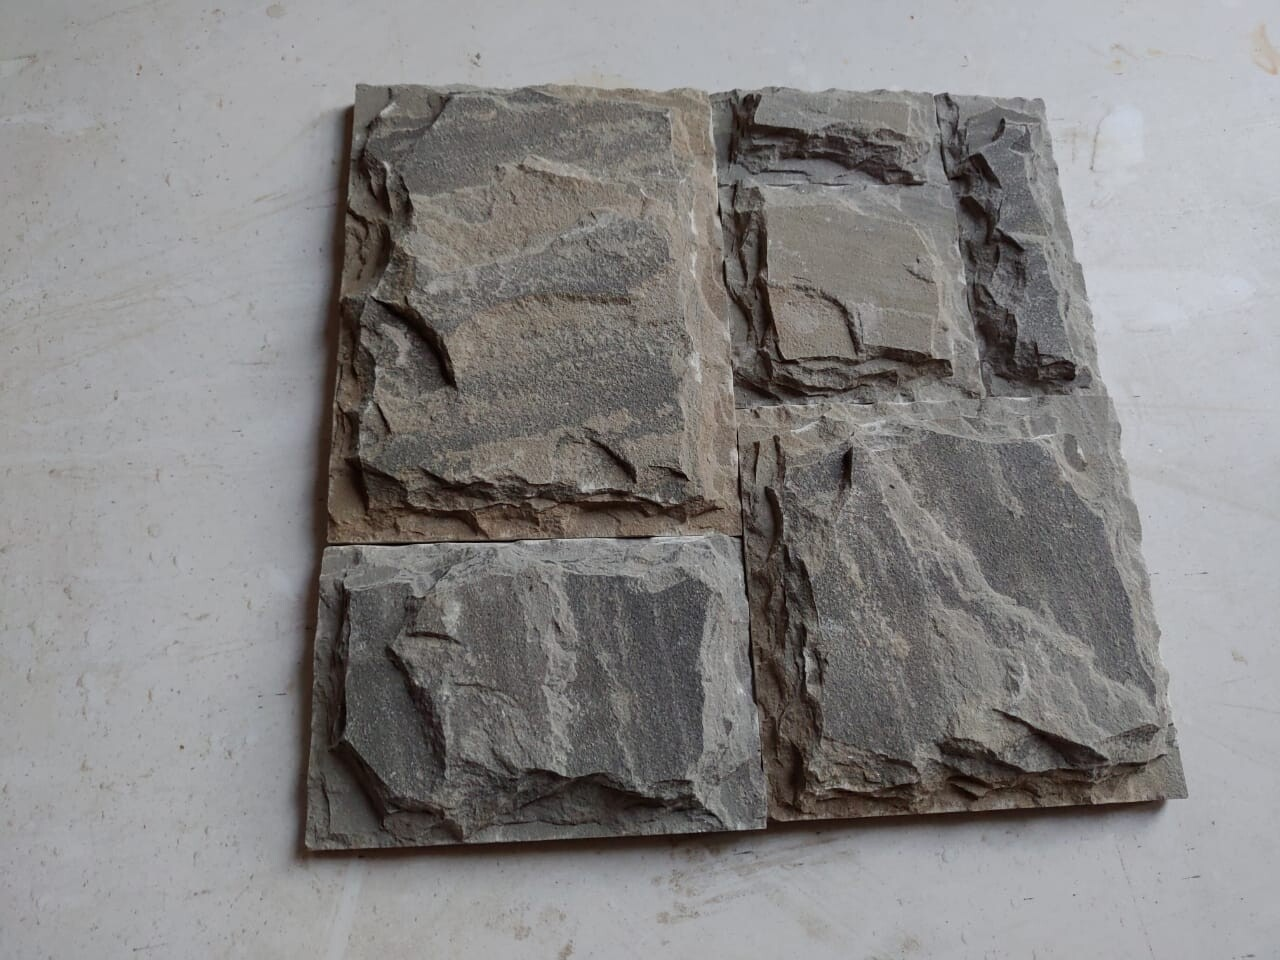 Set Pattern Sagar Black Chiselled